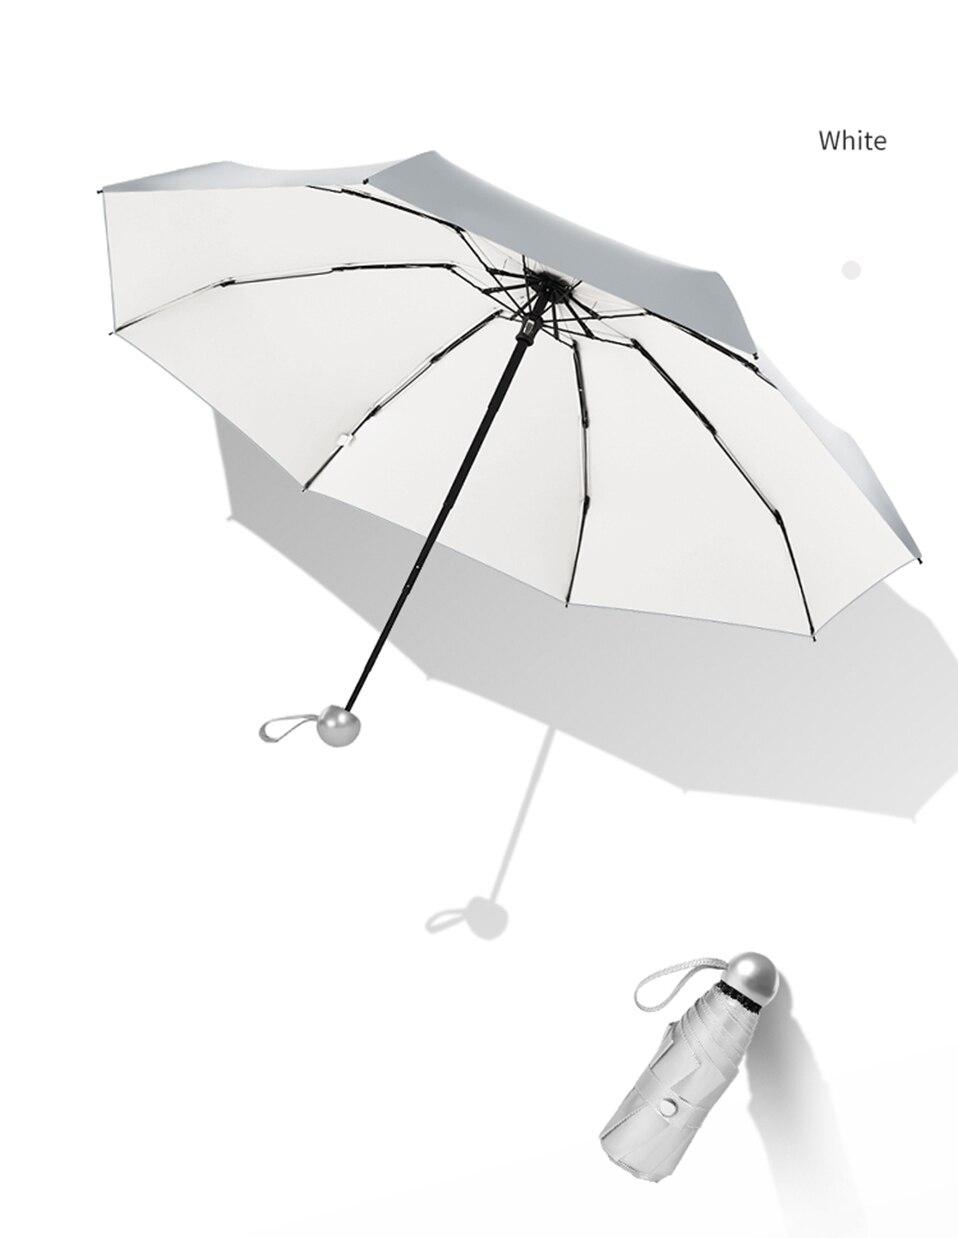 8 Bones Pocket Mini Umbrella Anti UV Paraguas Sun Umbrella Rain Windproof Light Folding Portable Umbrellas for Women Children (14)